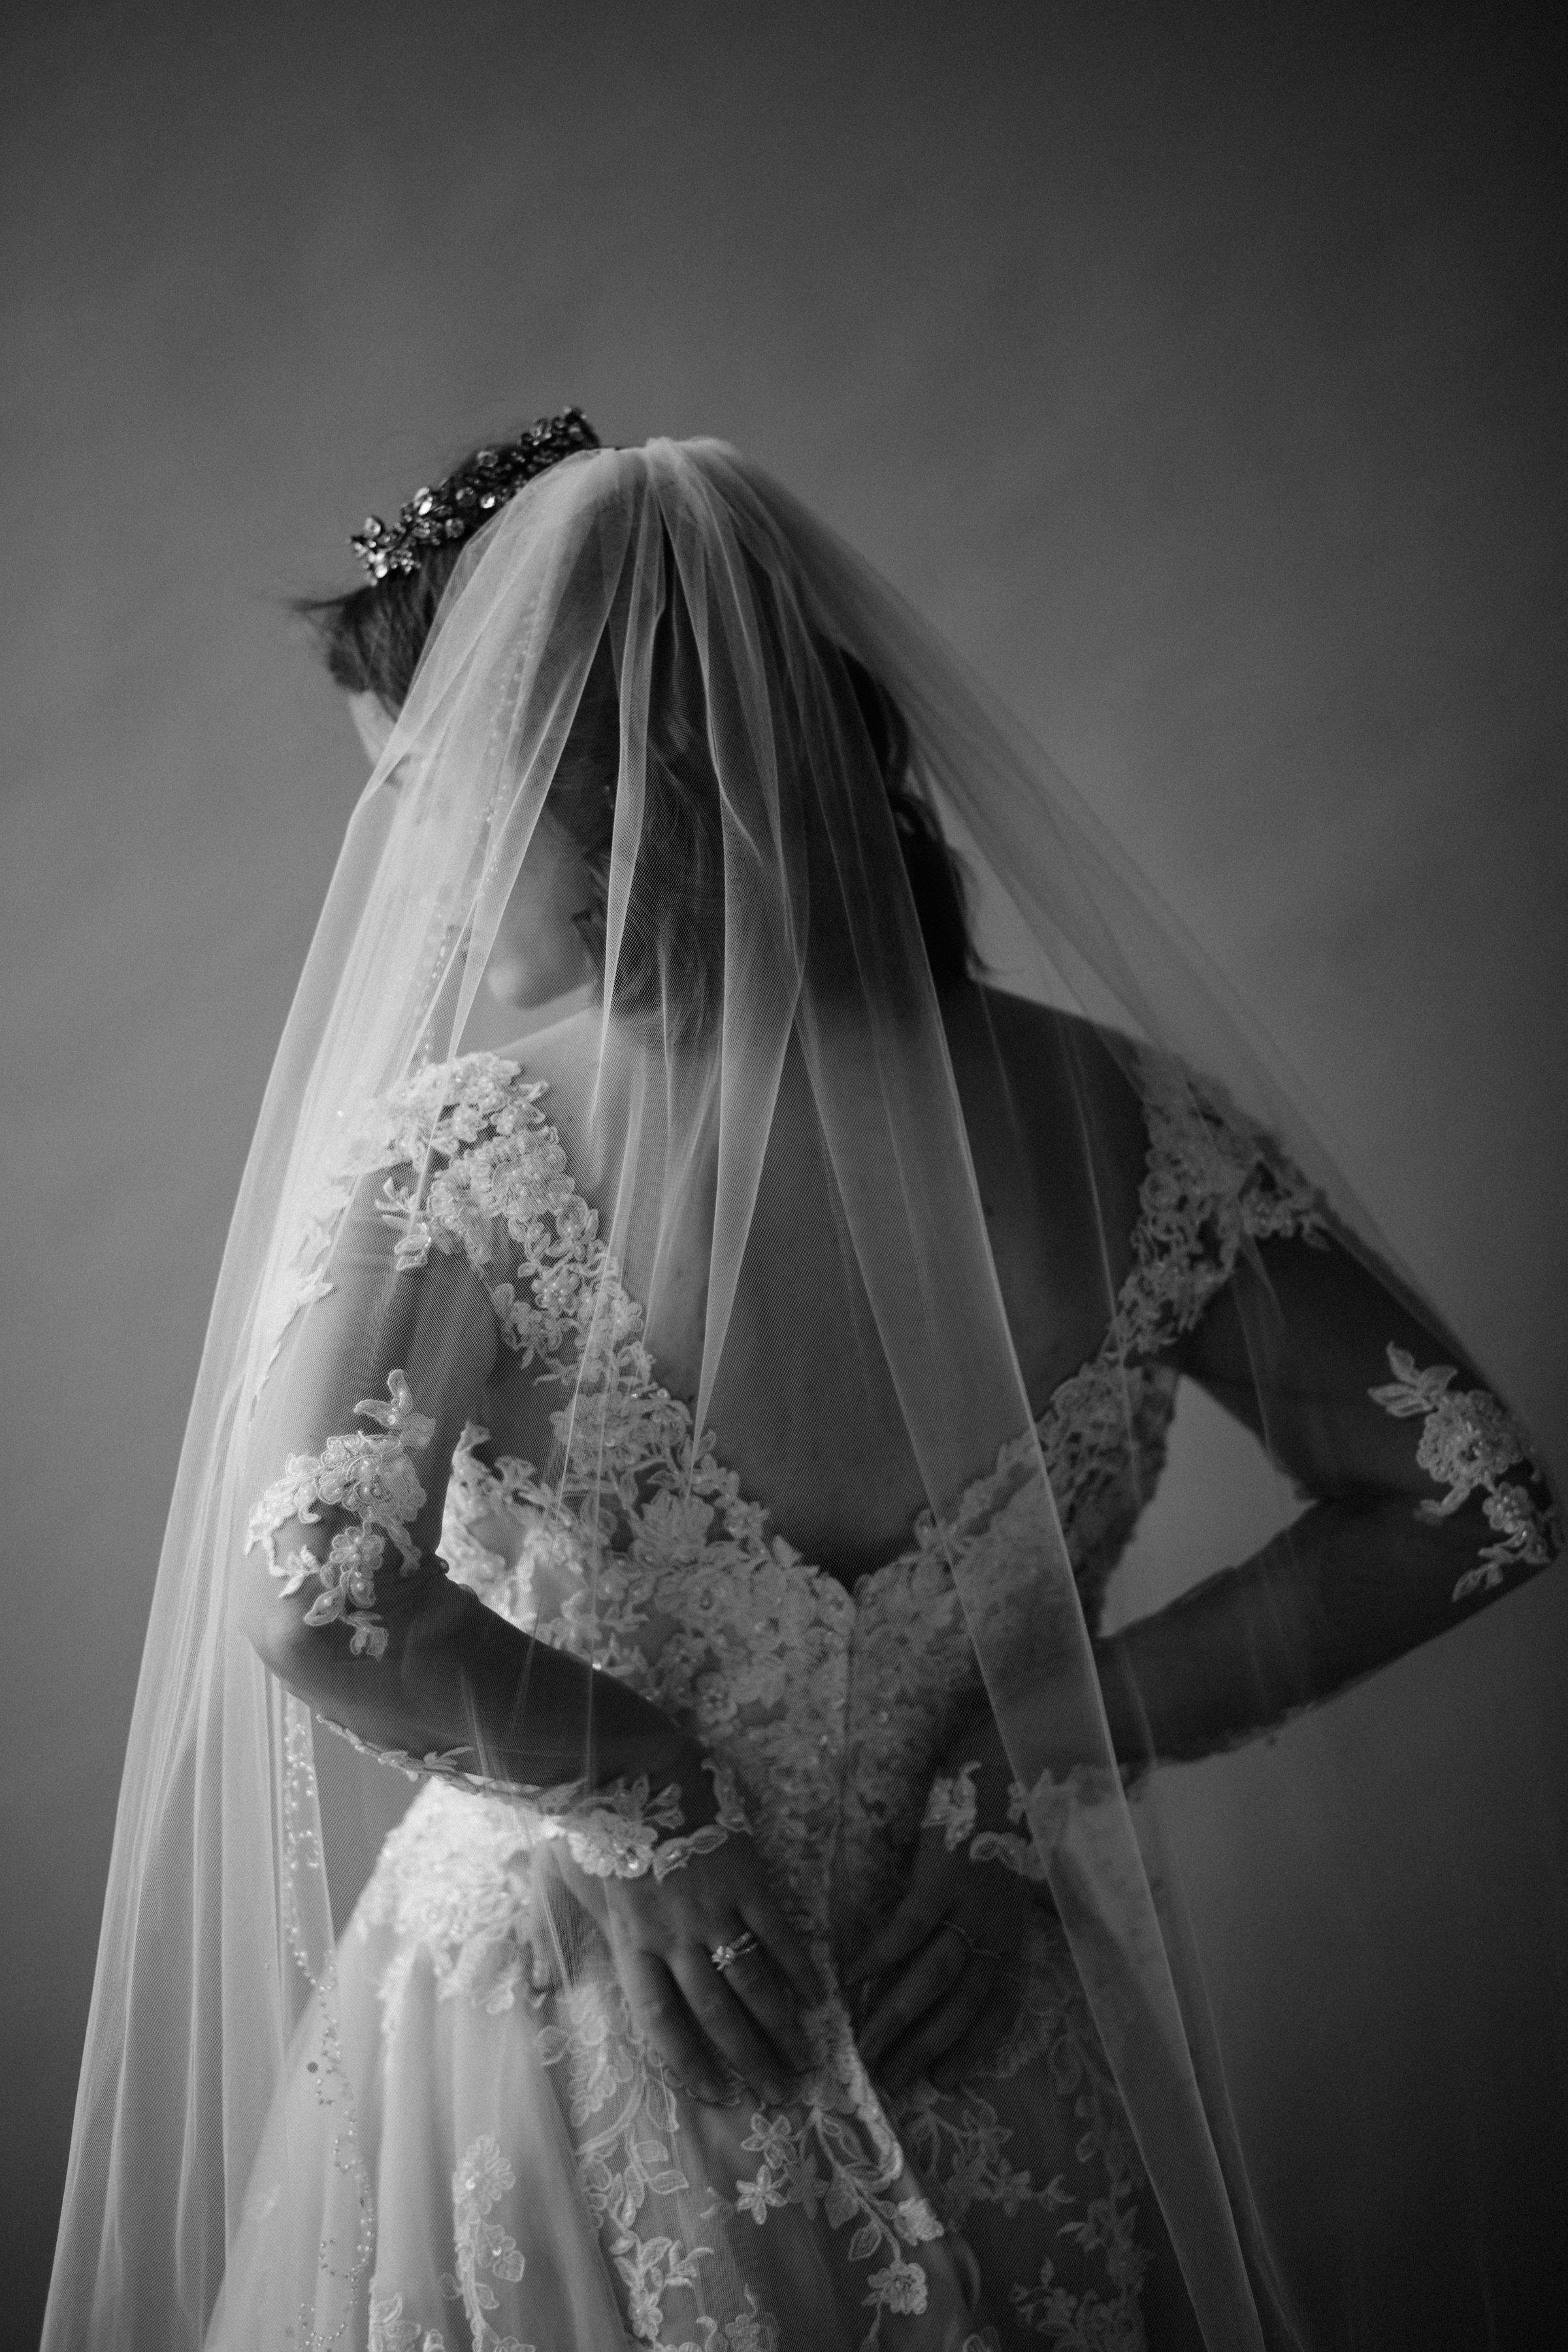 Headpiece: Hair Comes the Bride   Earring: Liz Law   Ring: Icon Stylist   Dress & Veil: Bel Fiore Bridal , Essence of Australia   Hair & Makeup: Corianne Elizabeth Beauty   Photography: Michelle Scott Photography